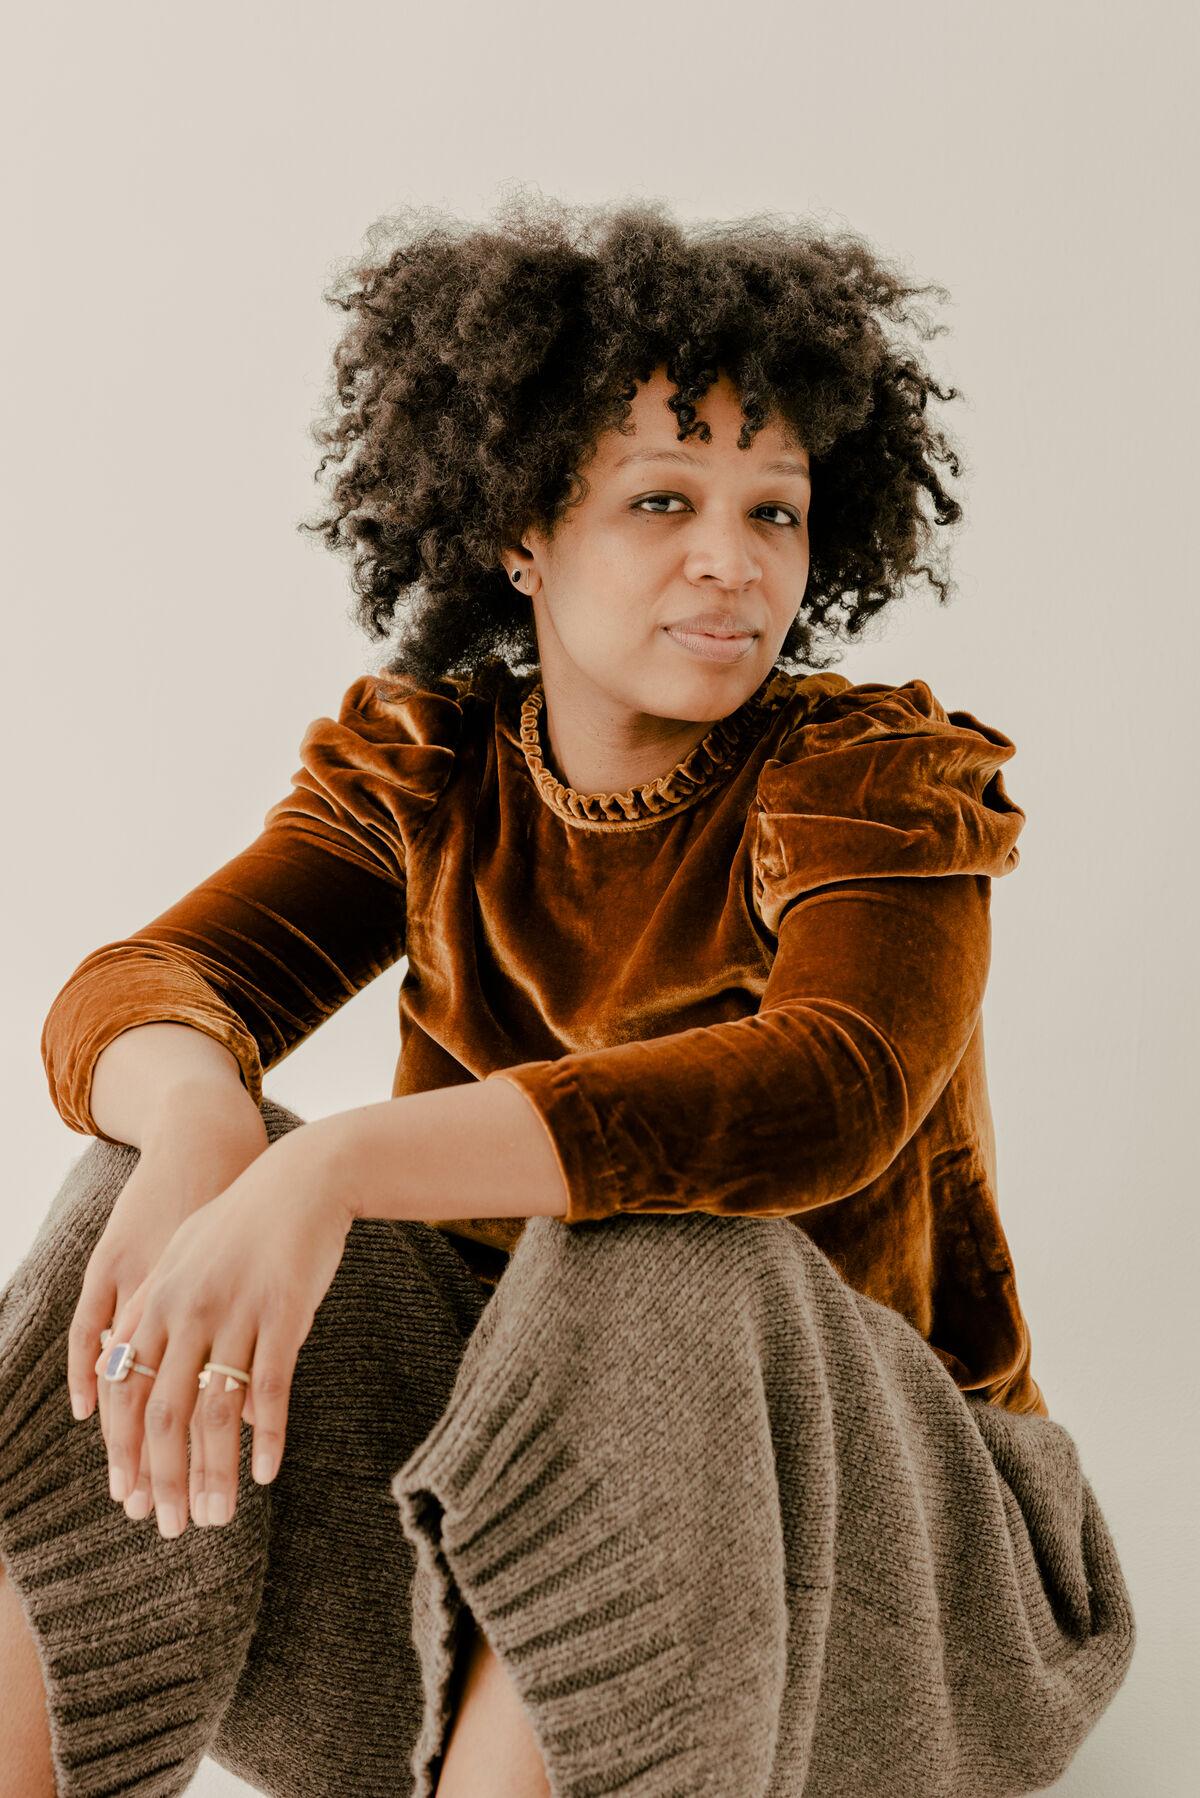 Allison Janae Hamilton by Daniel Dorsa for Artsy.